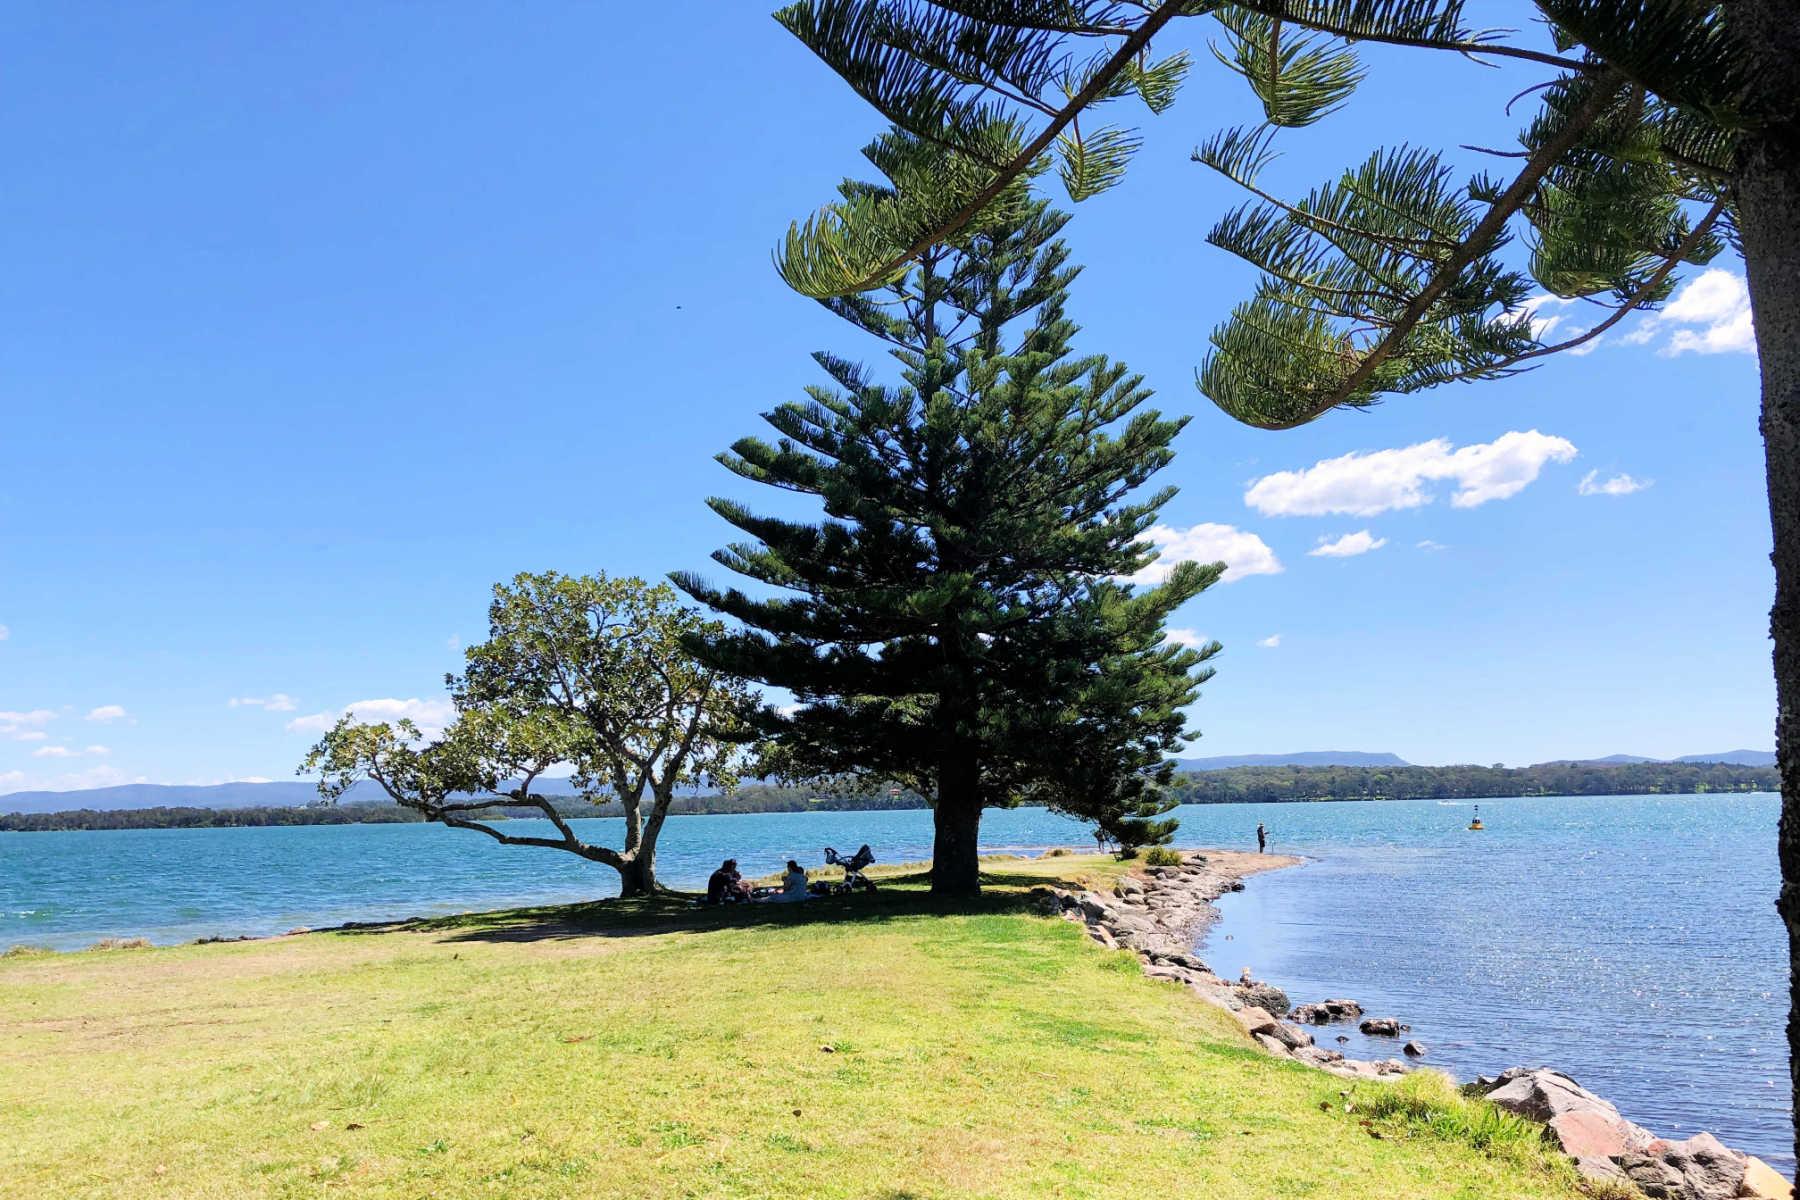 shingle-splitters-point-lake-macquarie-main